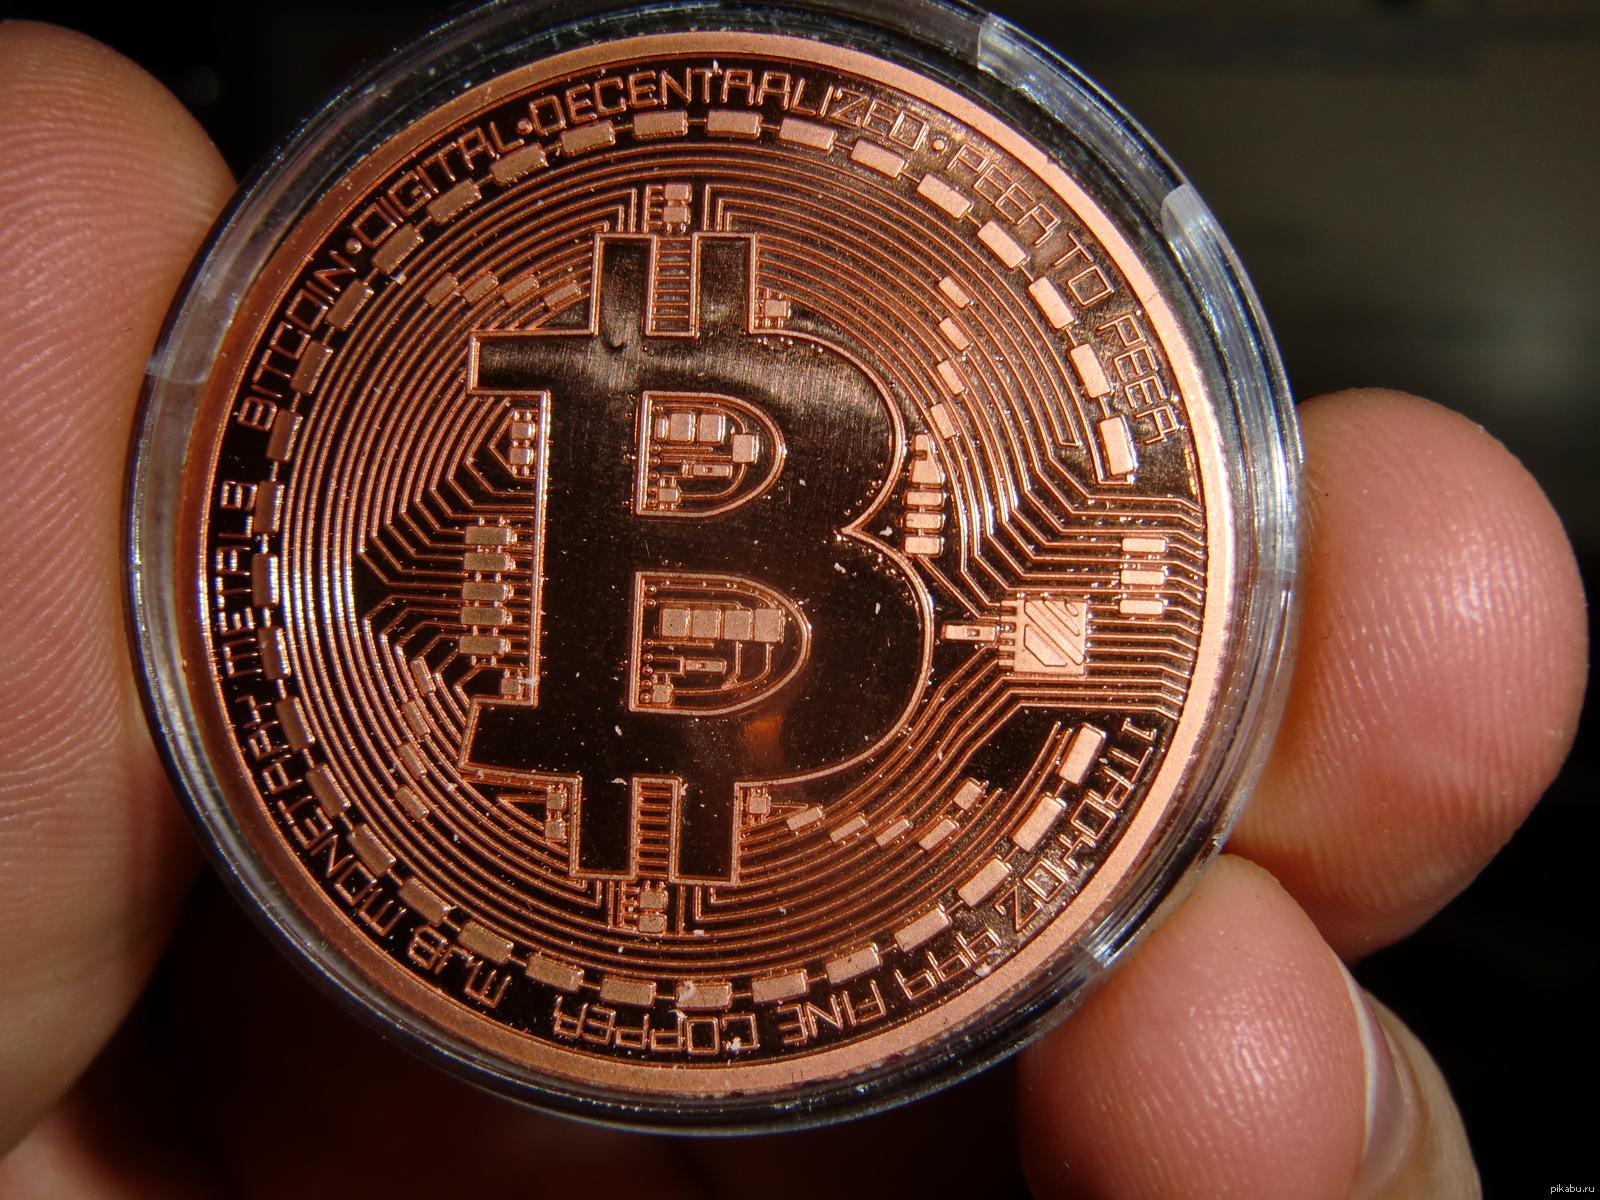 Монет биткоин резюме на работу word онлайн